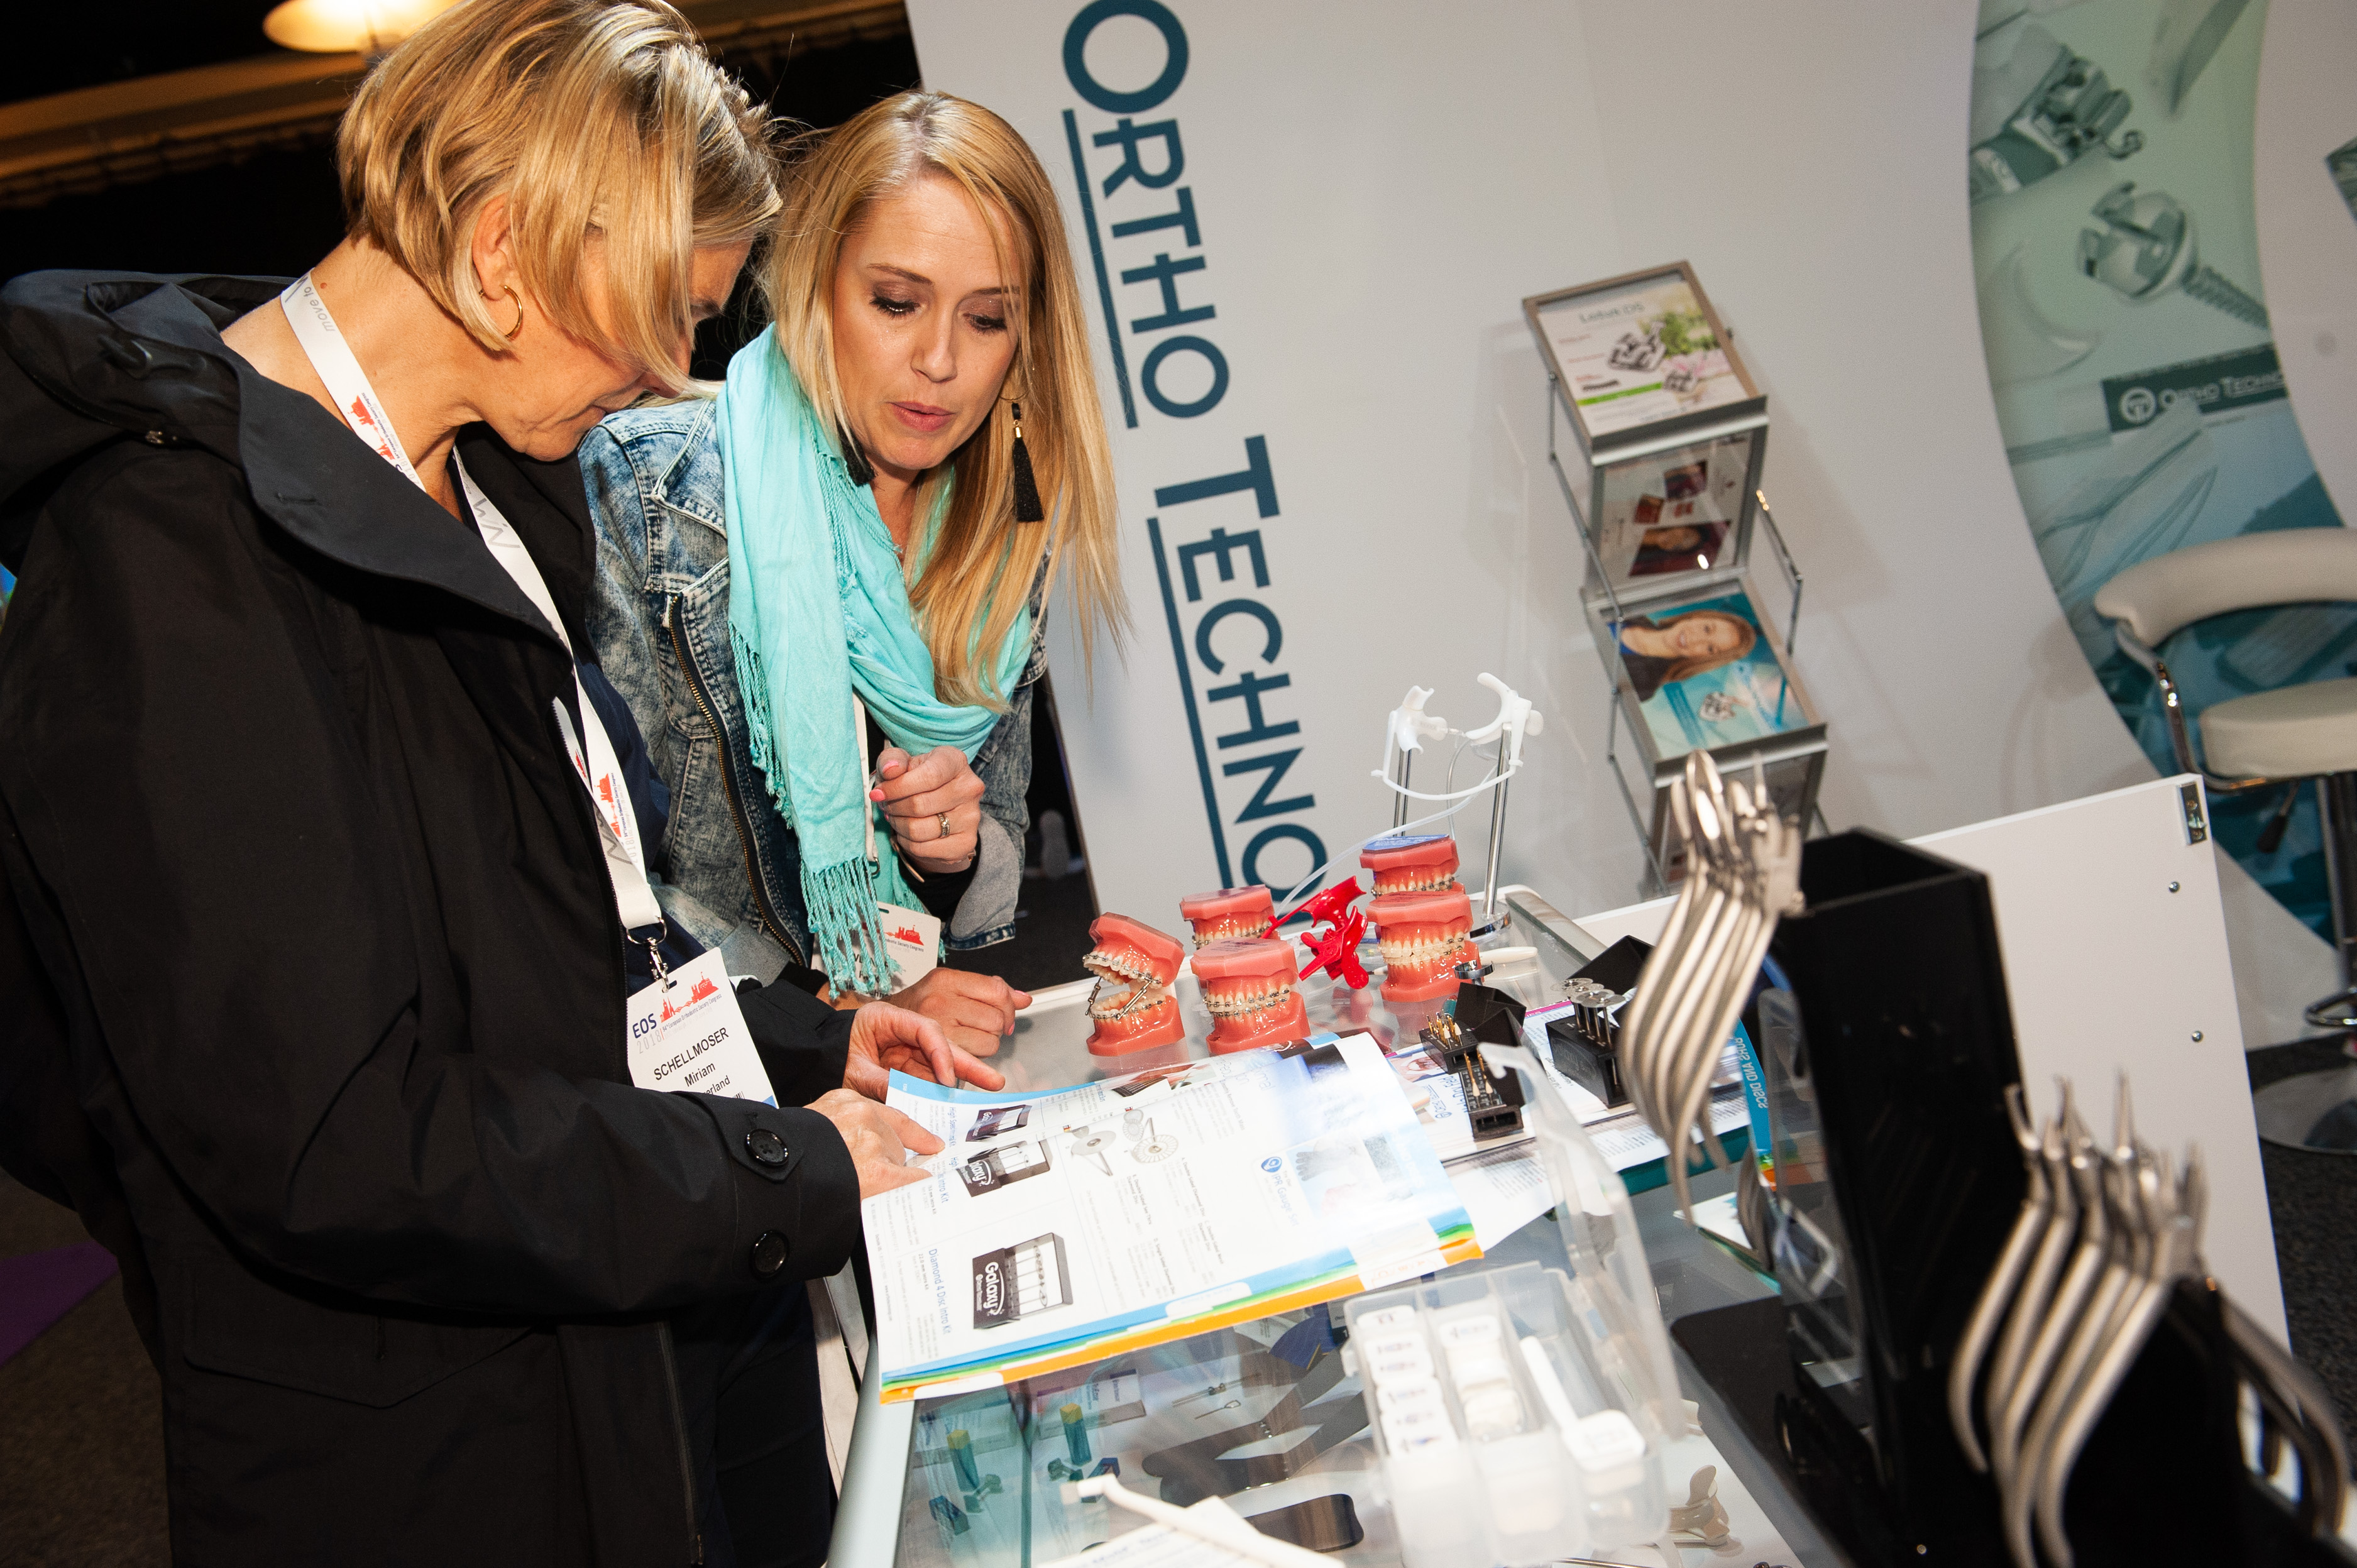 European Orthodontic Society Congress - Case Study